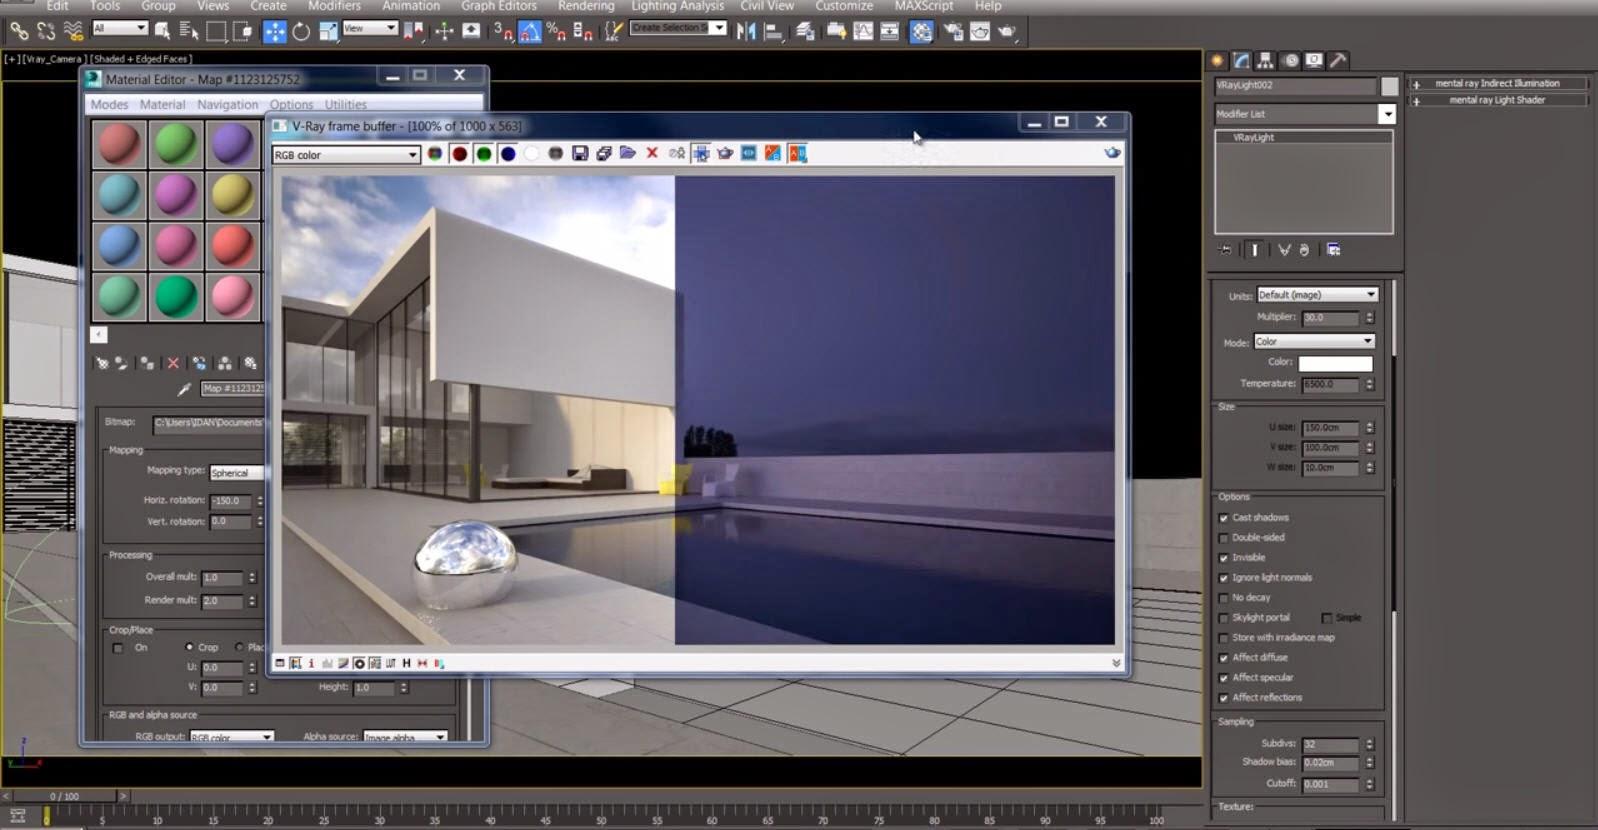 How to setup V-Ray HDRI lighting for Exterior render in 3ds